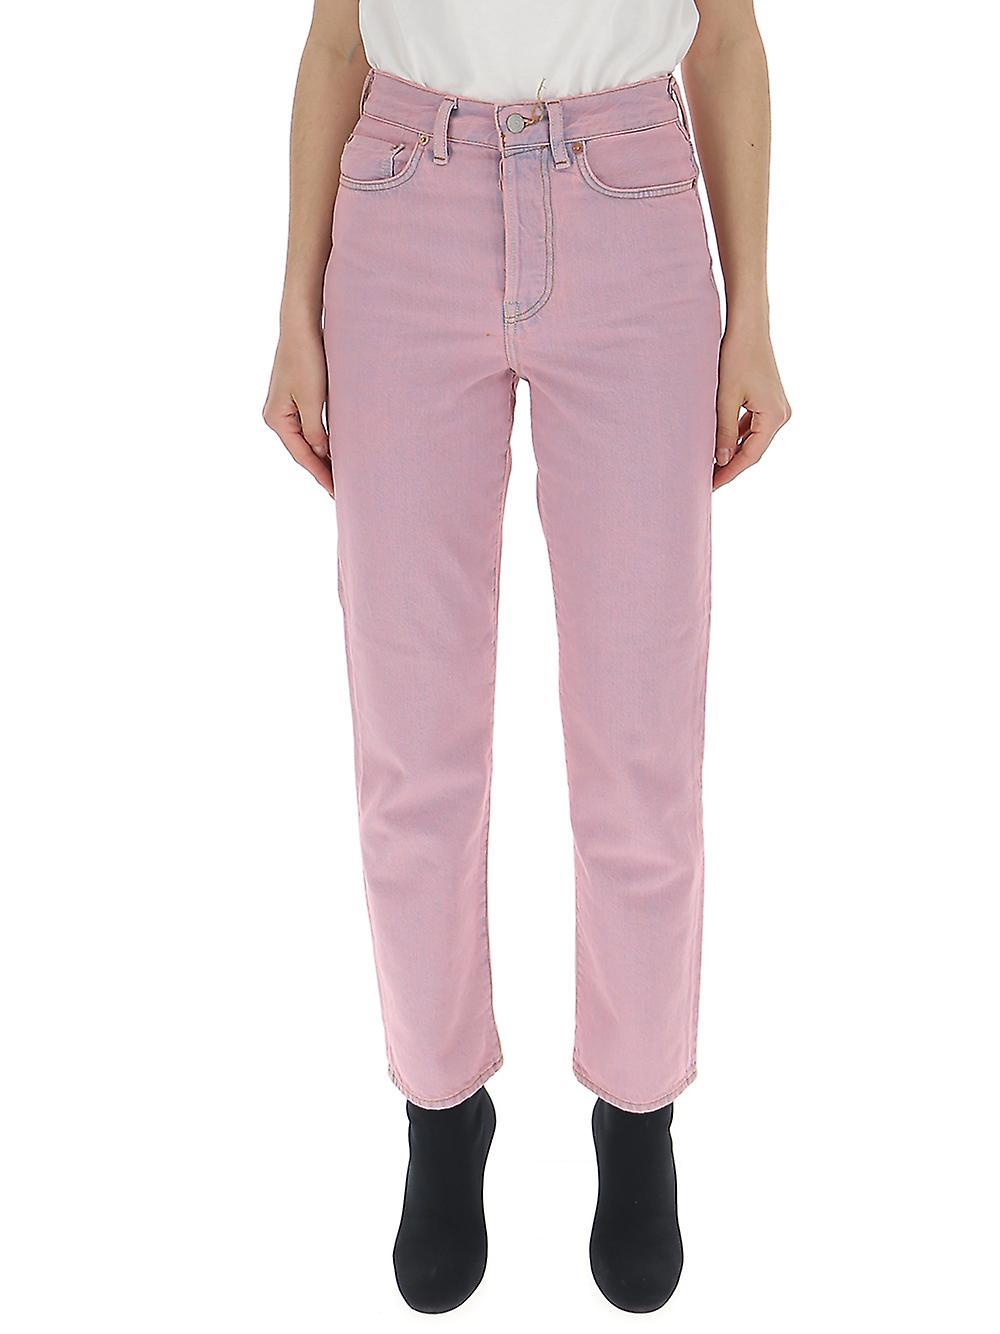 Acne Studios Pink Denim Jeans